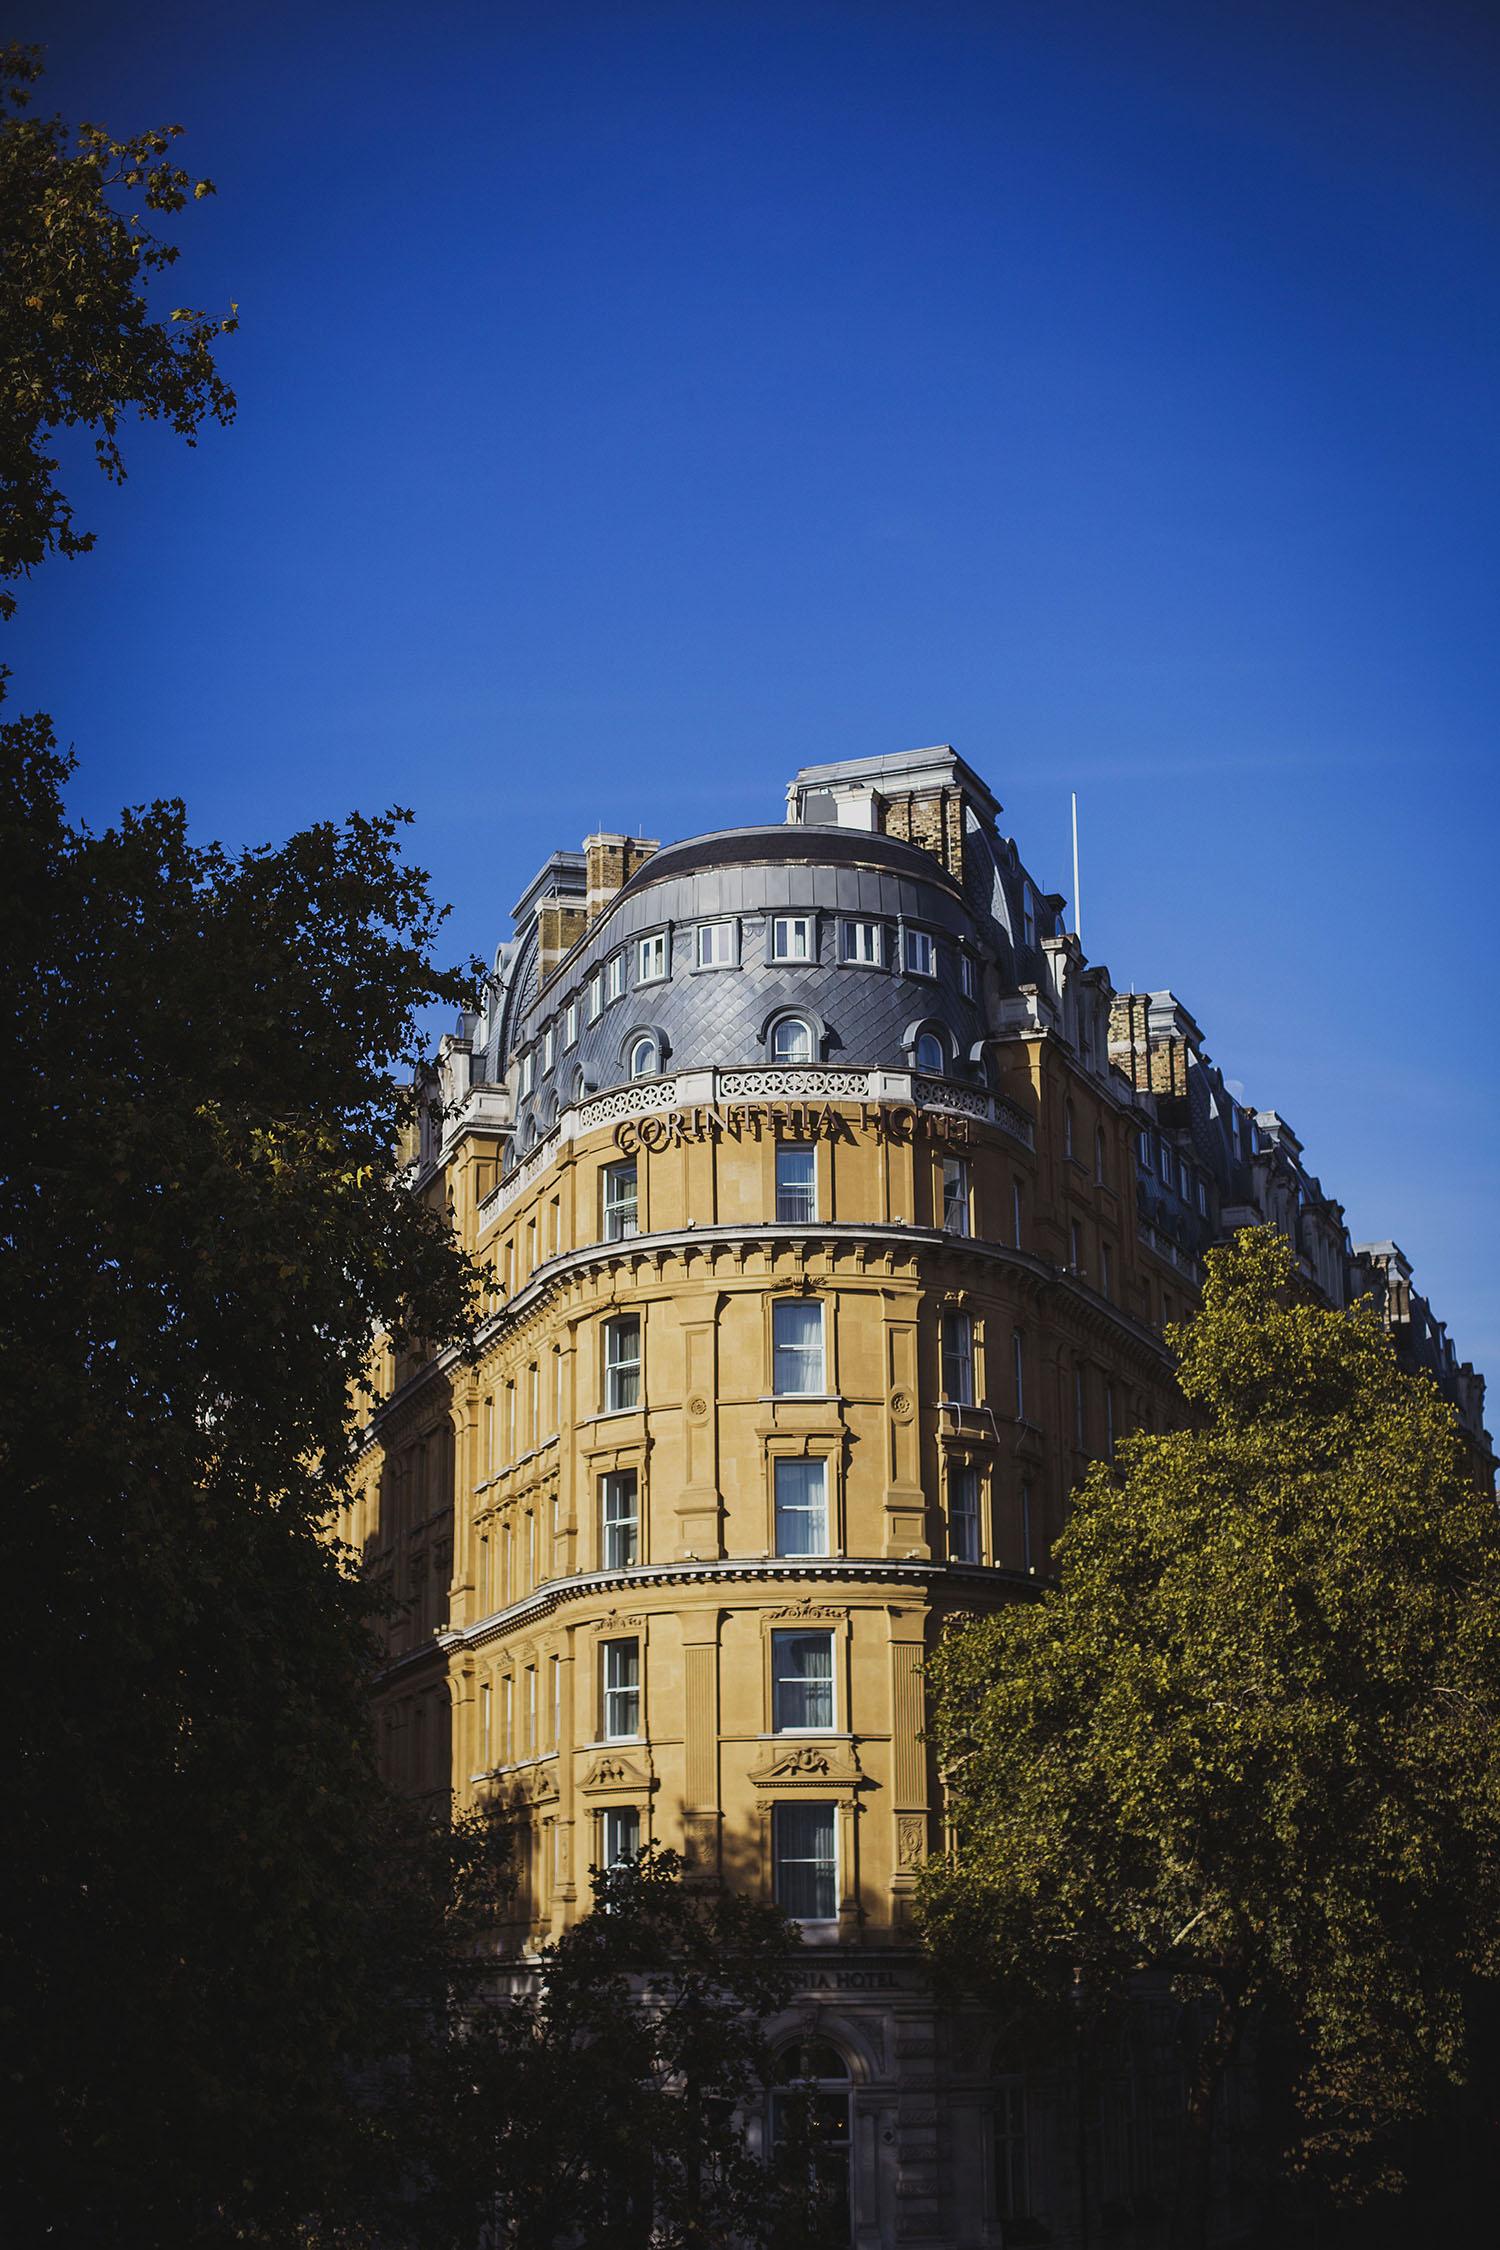 corinthia hotel london corinthia hotel wedding photographer